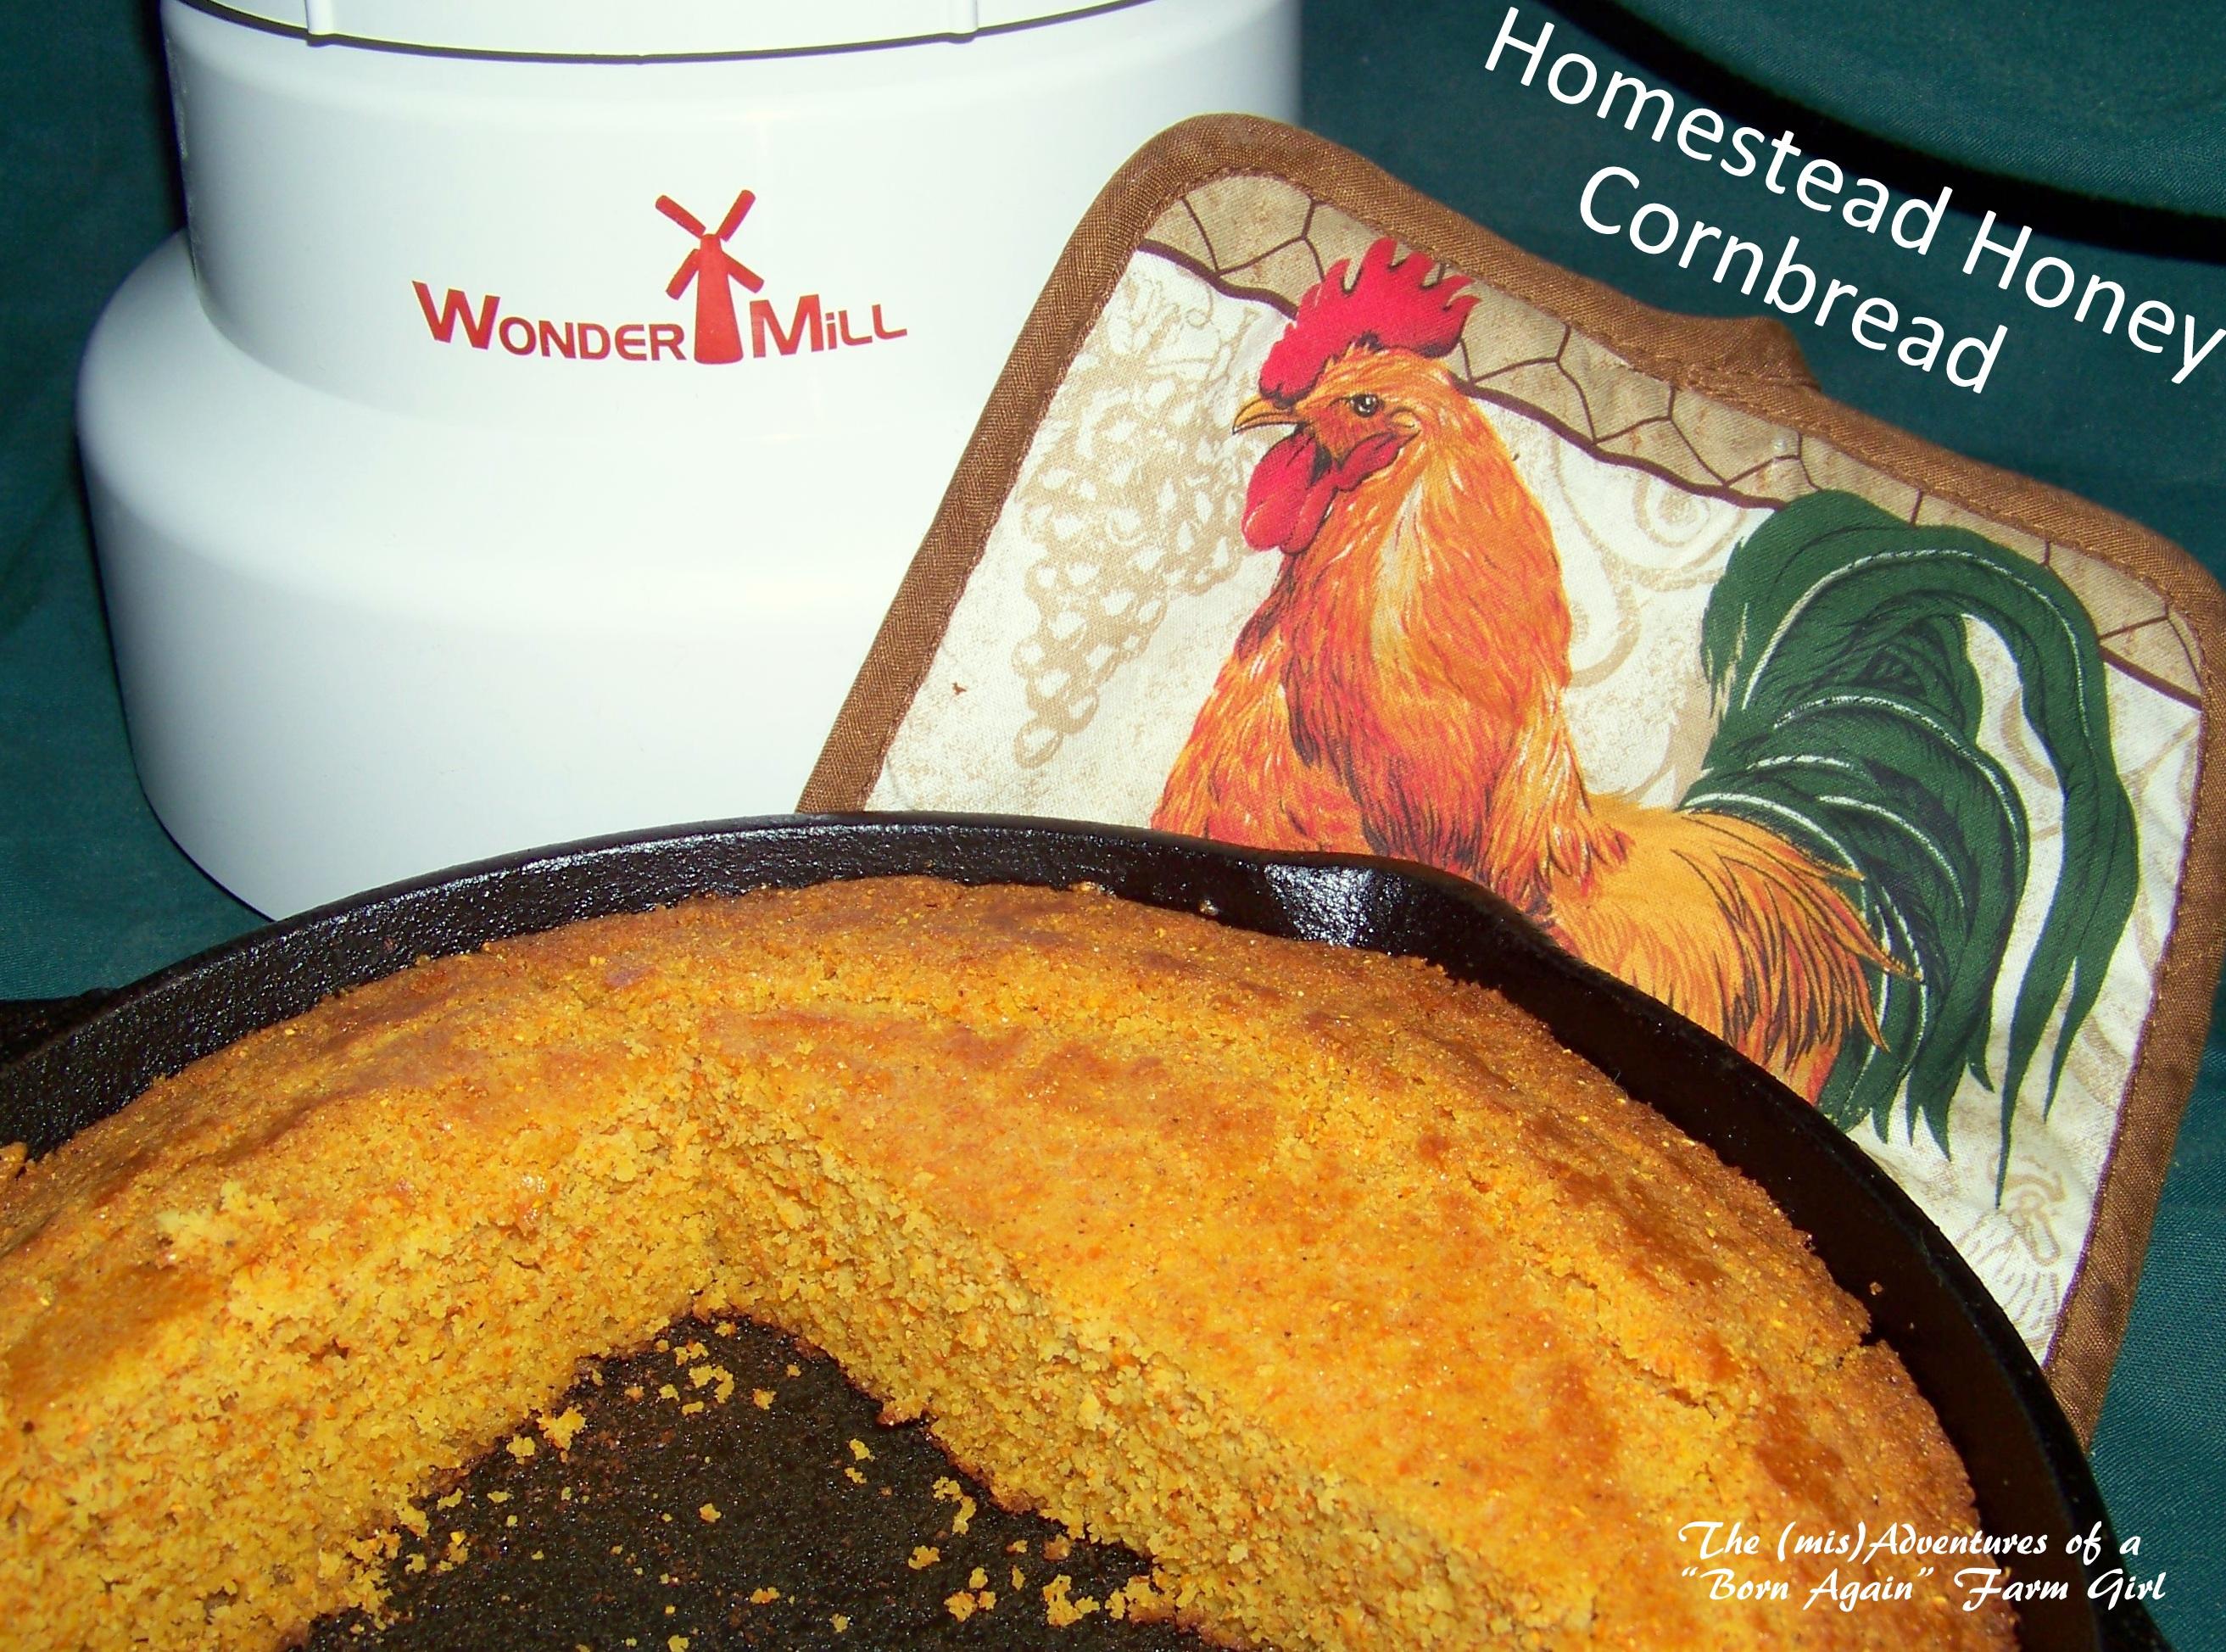 Homestead Honey Cornbread